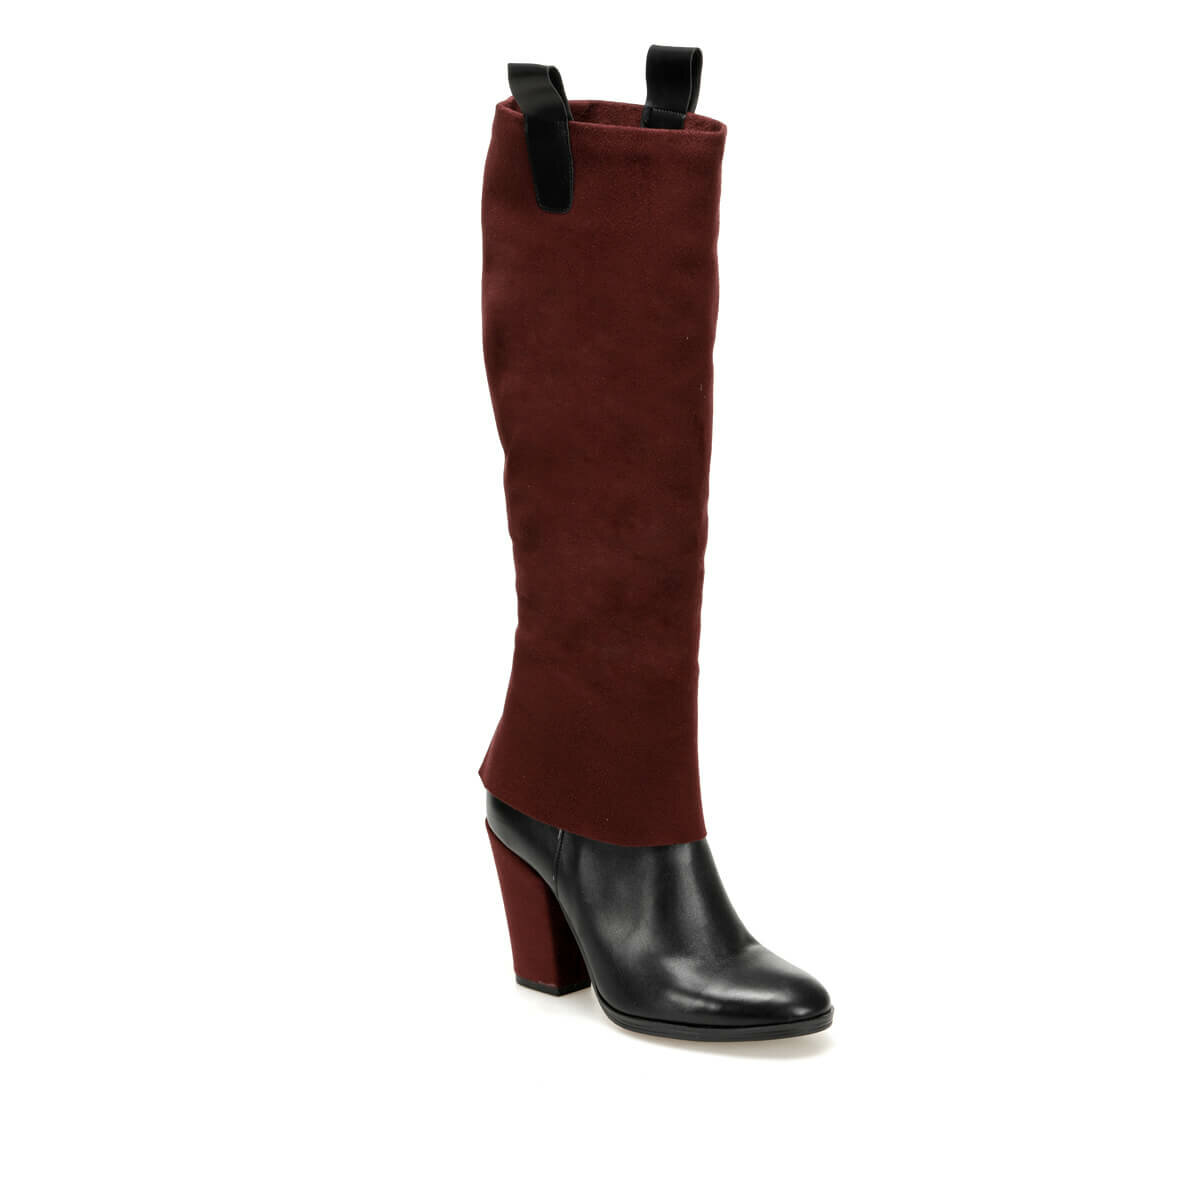 FLO PERSIE31Z SUEDE Maroon Women 'S Boots BUTIGO